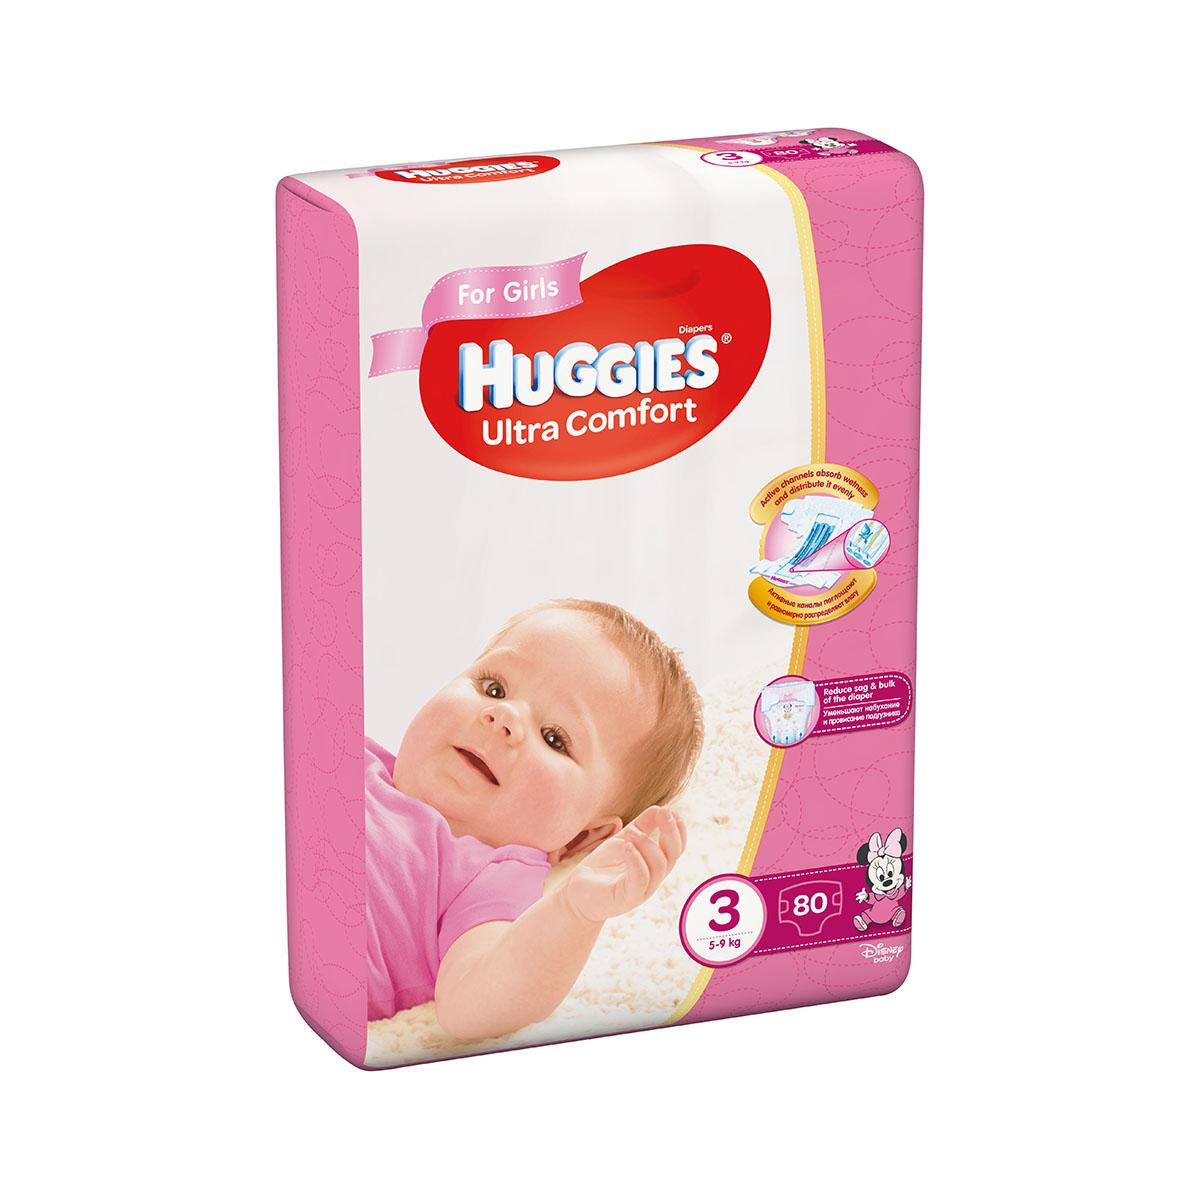 Scutece Huggies Mega Comfort Girls, Nr 3, 5 - 9 Kg, 80 buc imagine